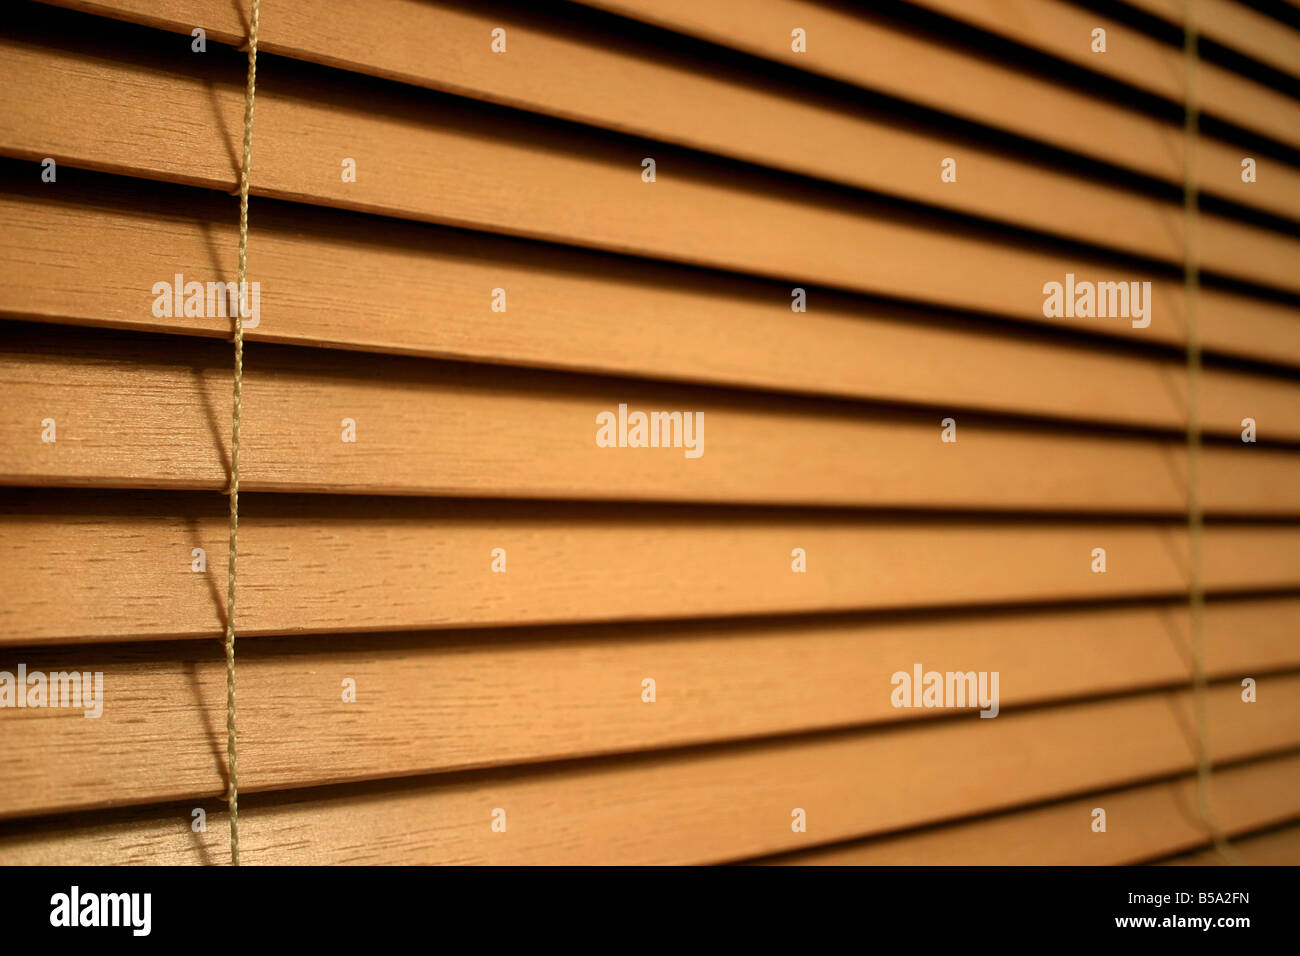 Nahaufnahme Detail der Holzlatte Vorhänge Stockbild